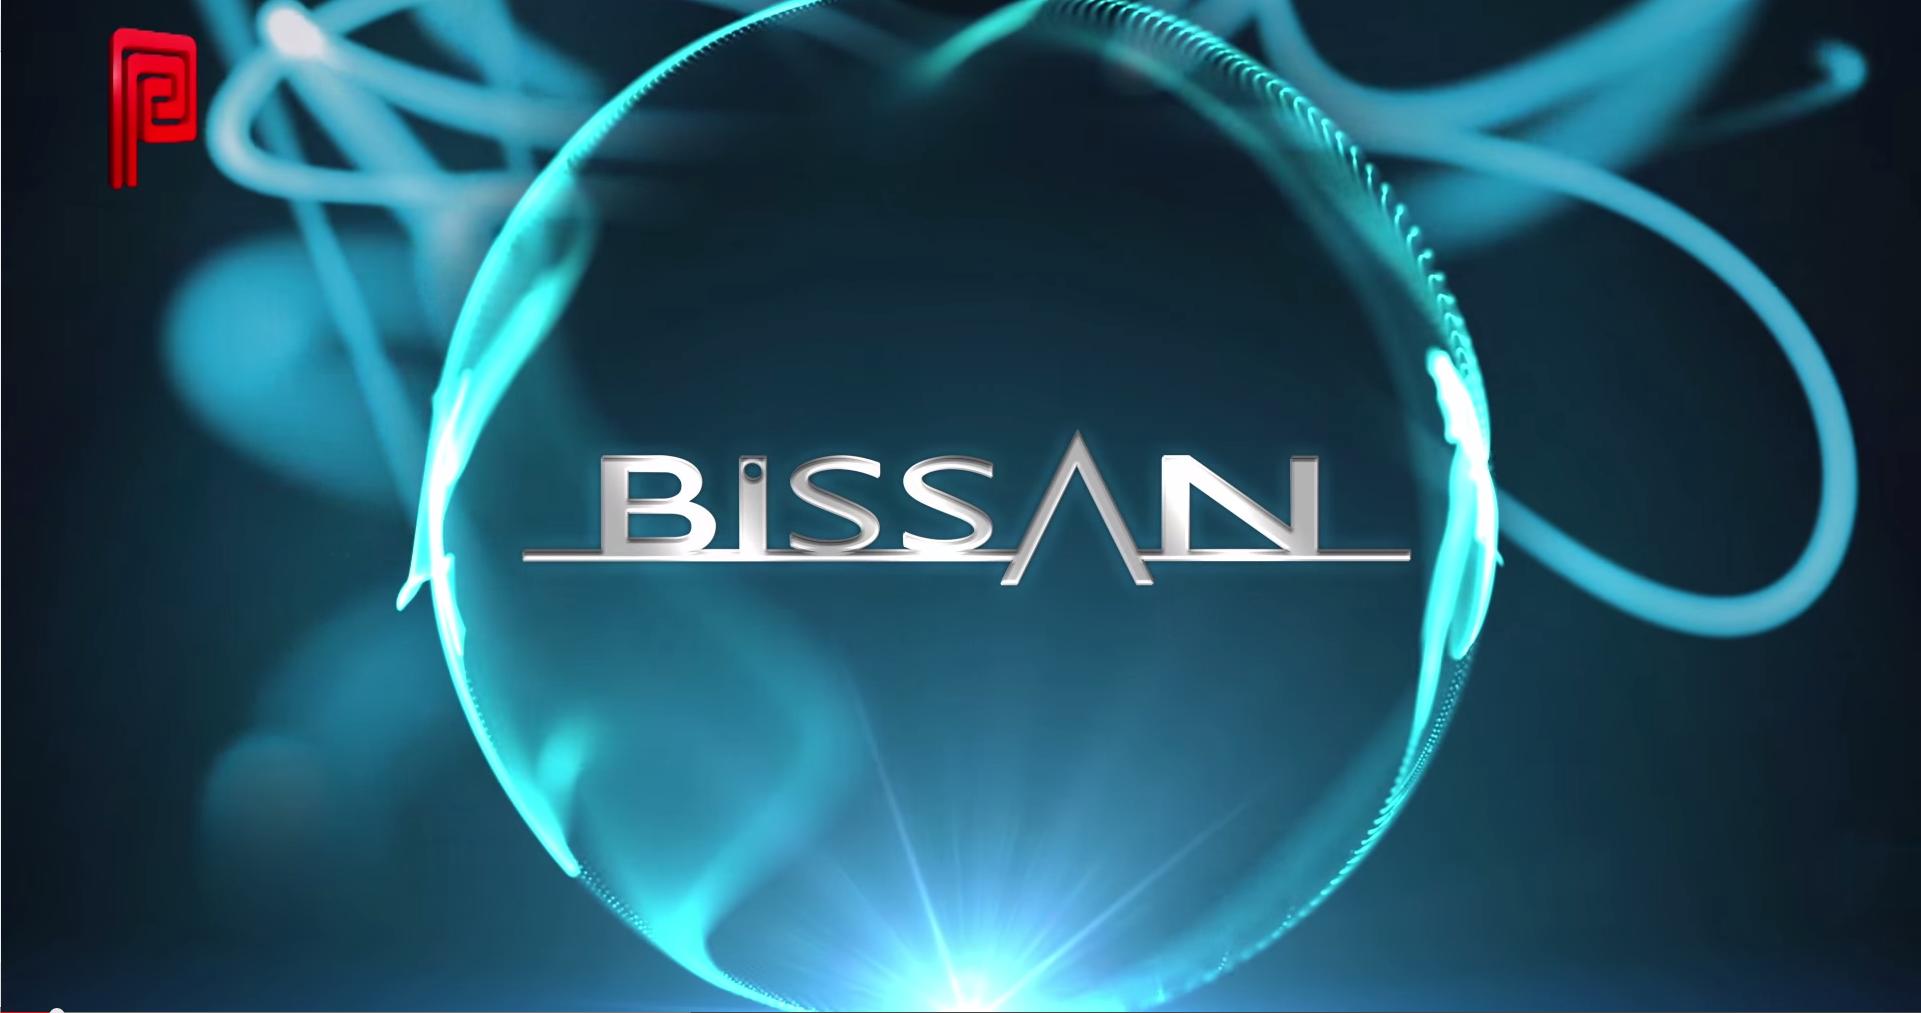 bissan_kaucuk